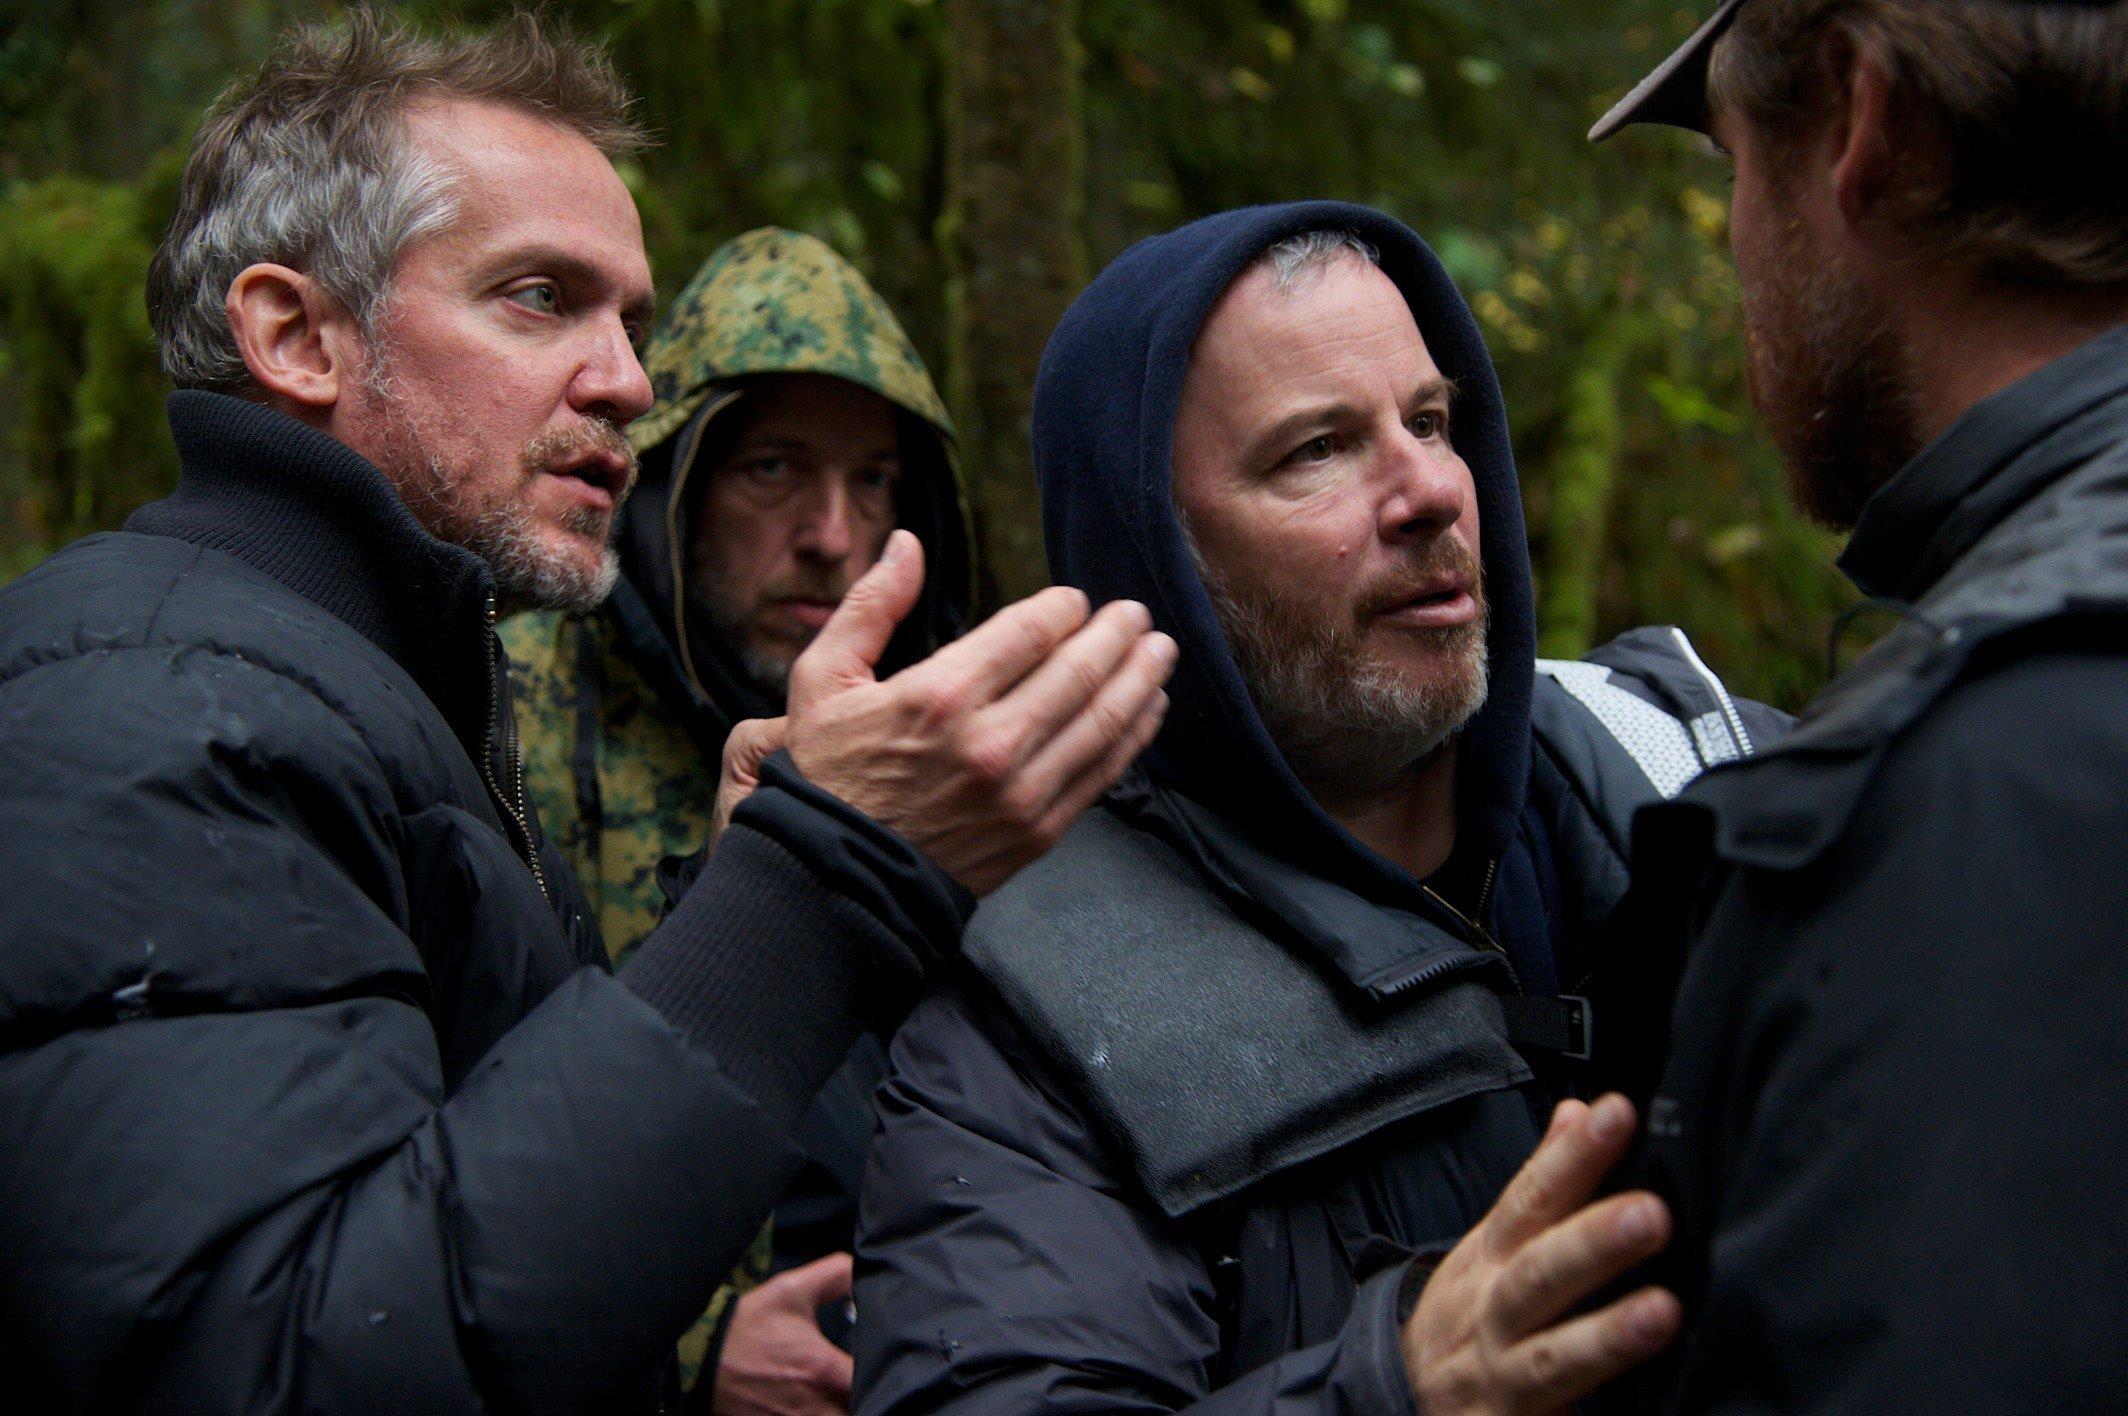 Jean-Marc Vallee & Urs Hirschbiegel & Yves Belanger - WILD